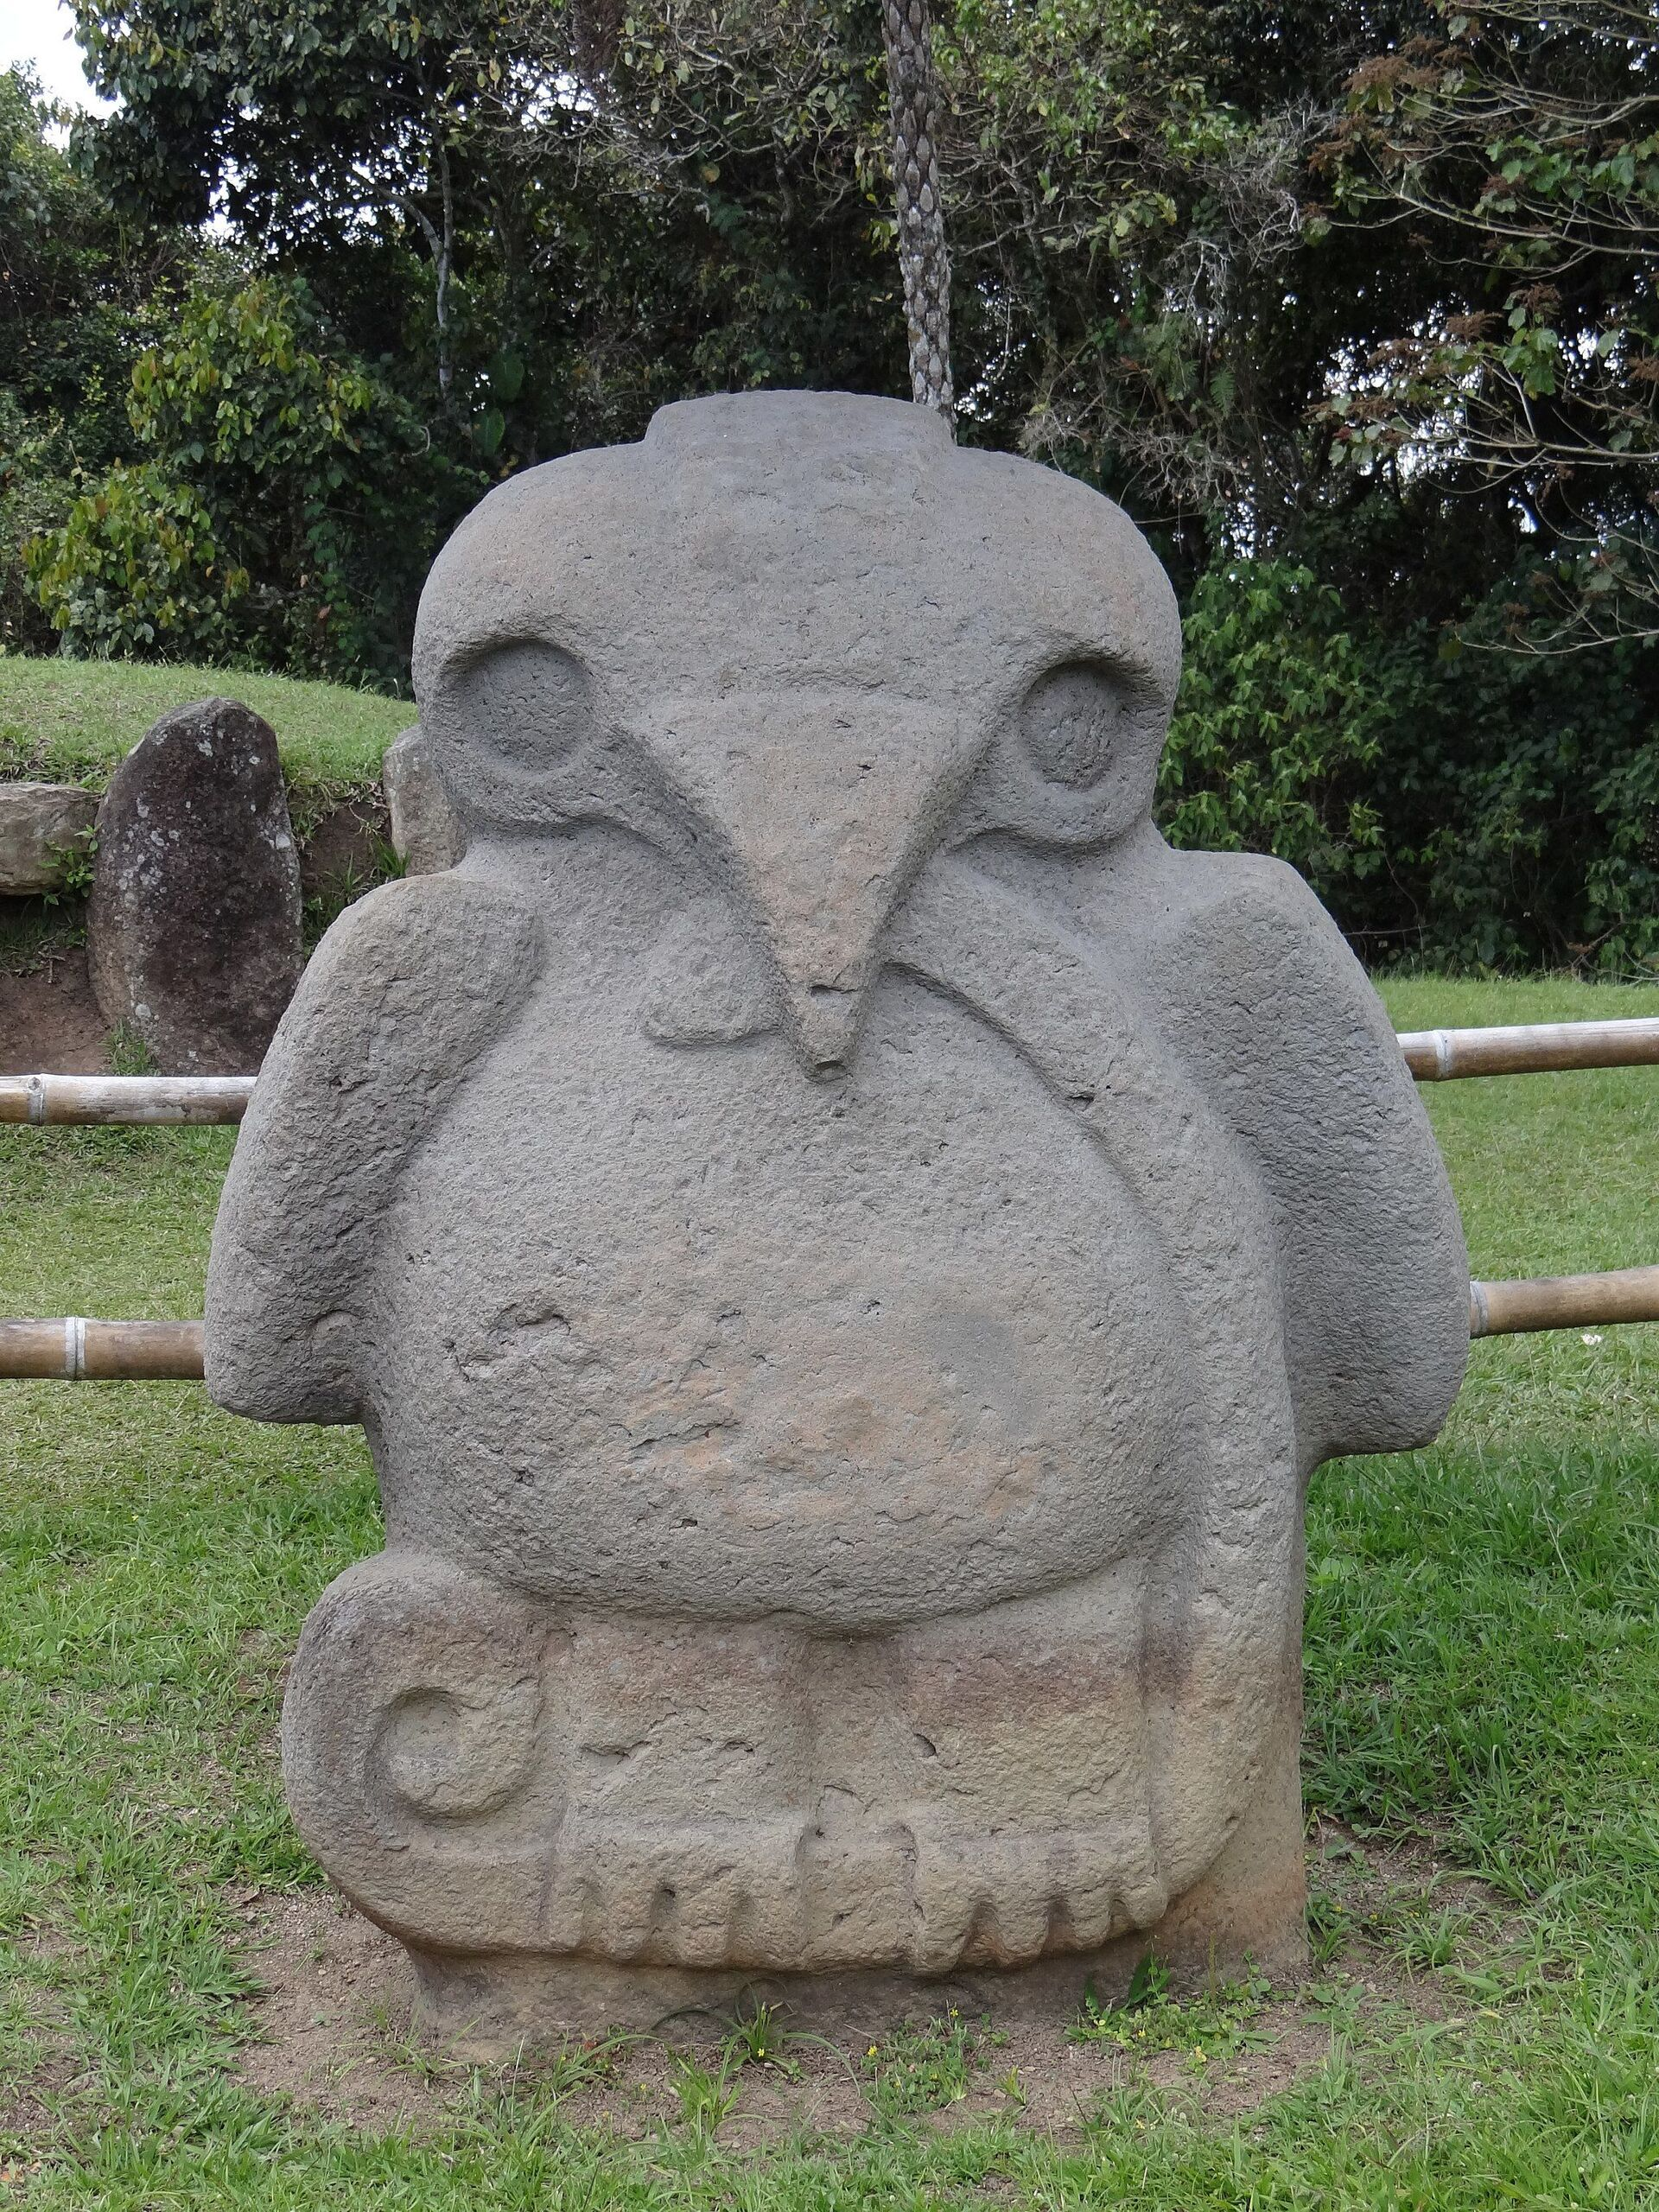 Estatua del Parque Nacional Arqueológico de San Agustín, Colombia  - Sputnik Mundo, 1920, 11.02.2021